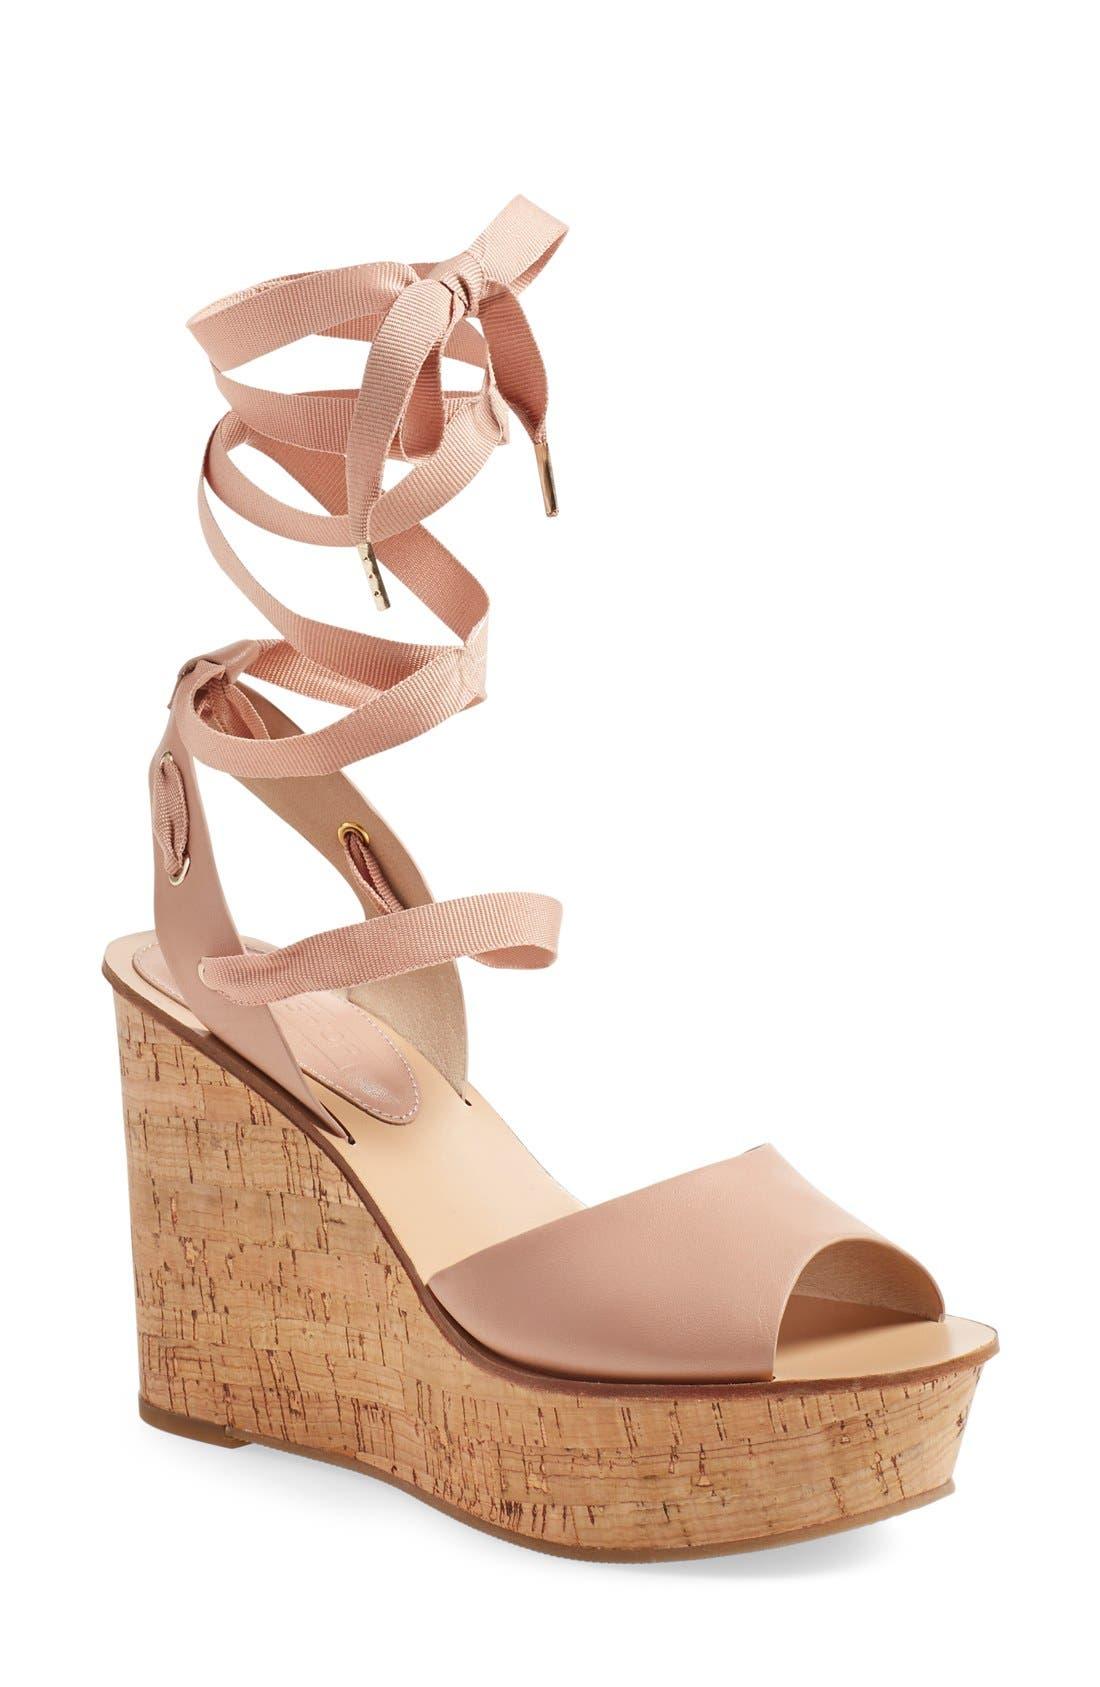 Alternate Image 1 Selected - Topshop 'Wise' Platform Wedge Sandal (Women)